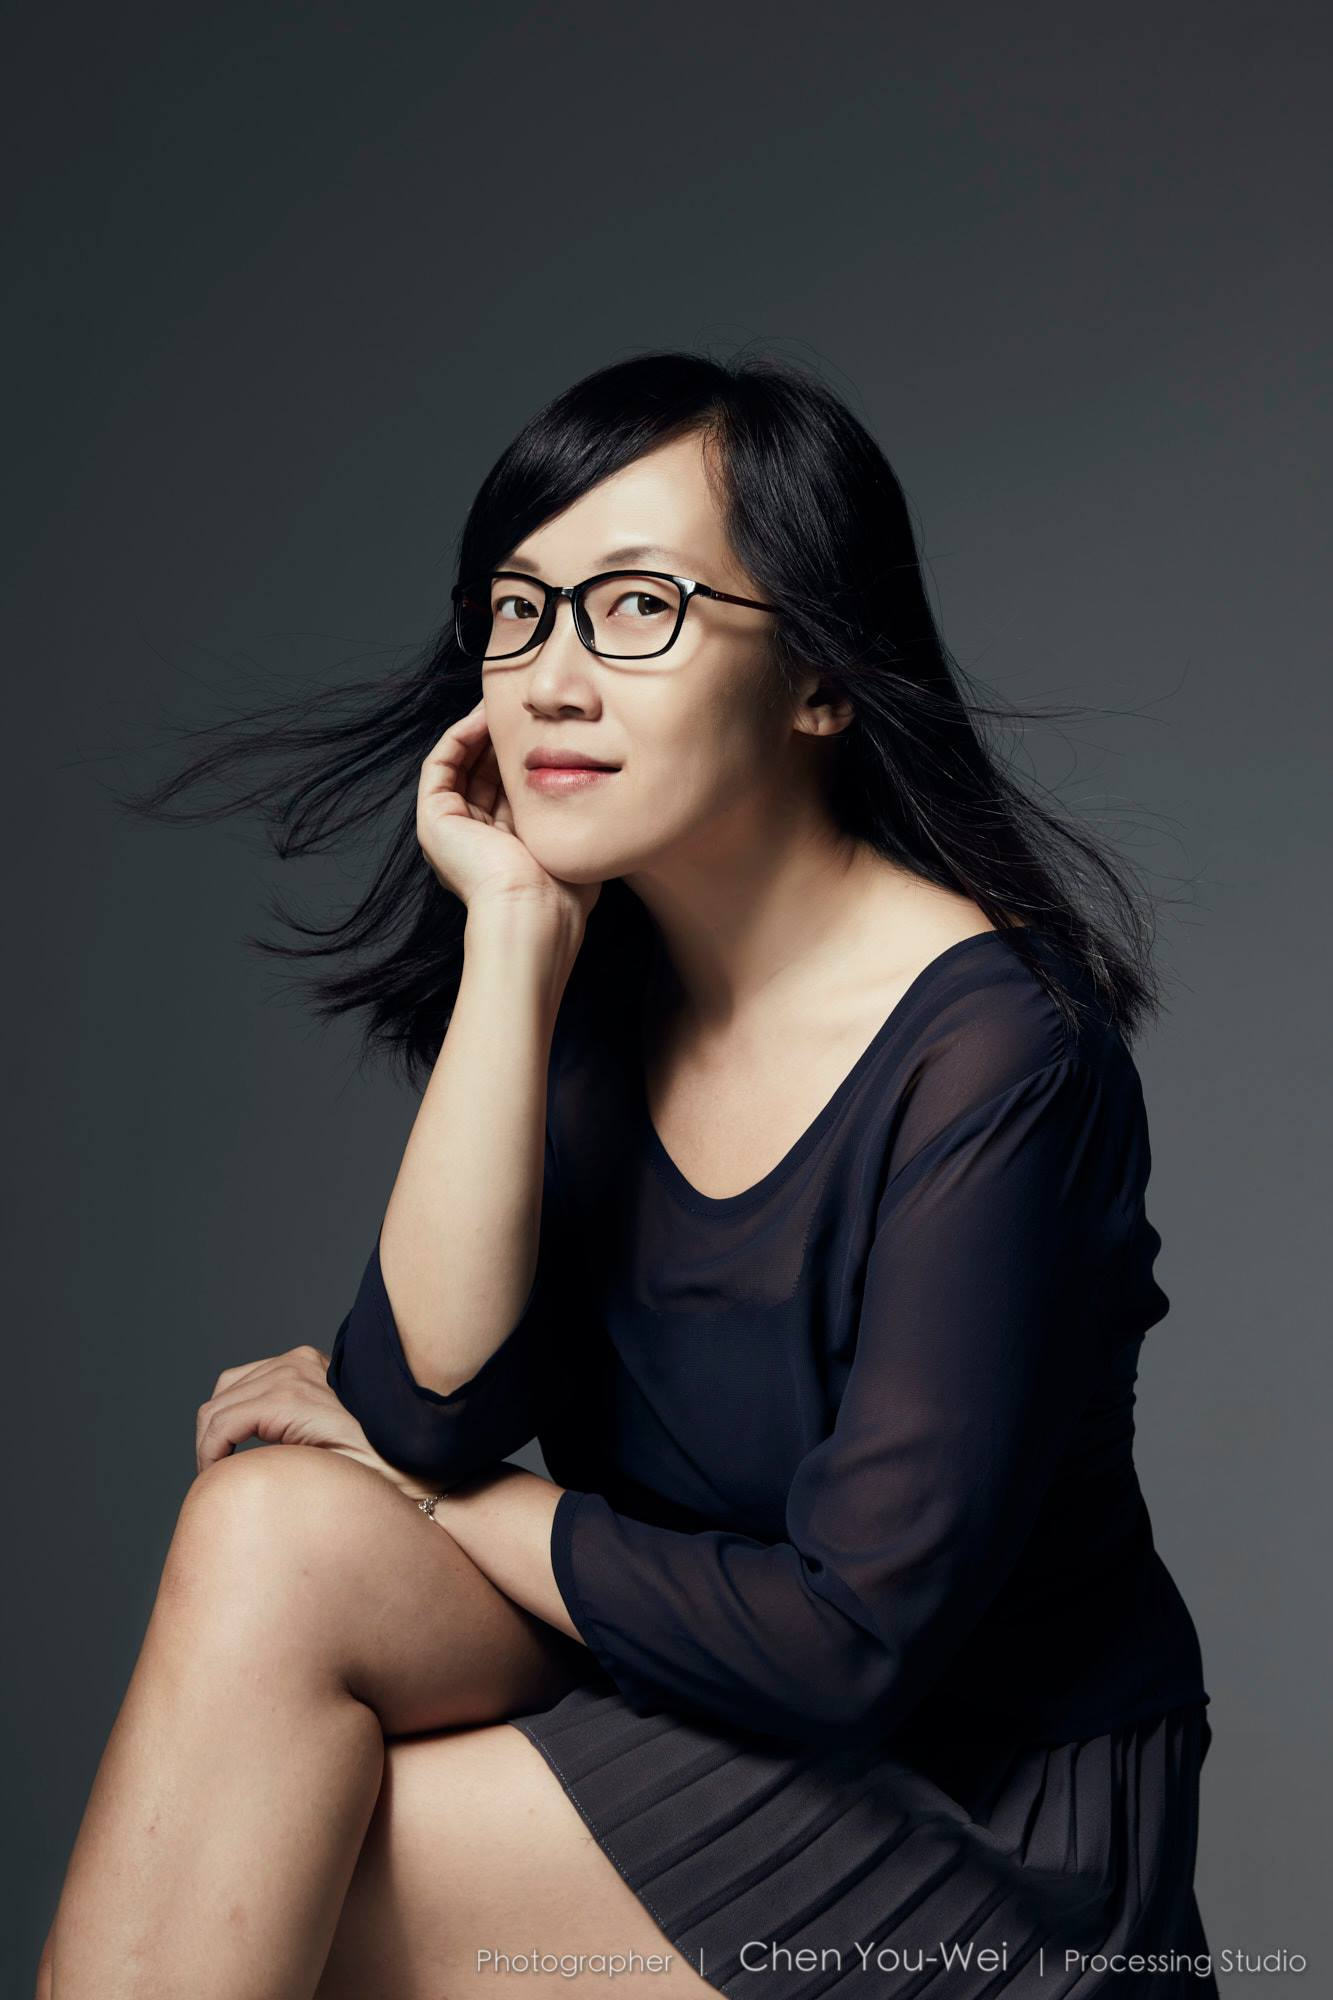 SM快樂的小燕/小令悄悄話<<當代藝術家 蘇匯宇VS張辰申>> 當代藝術的崛起